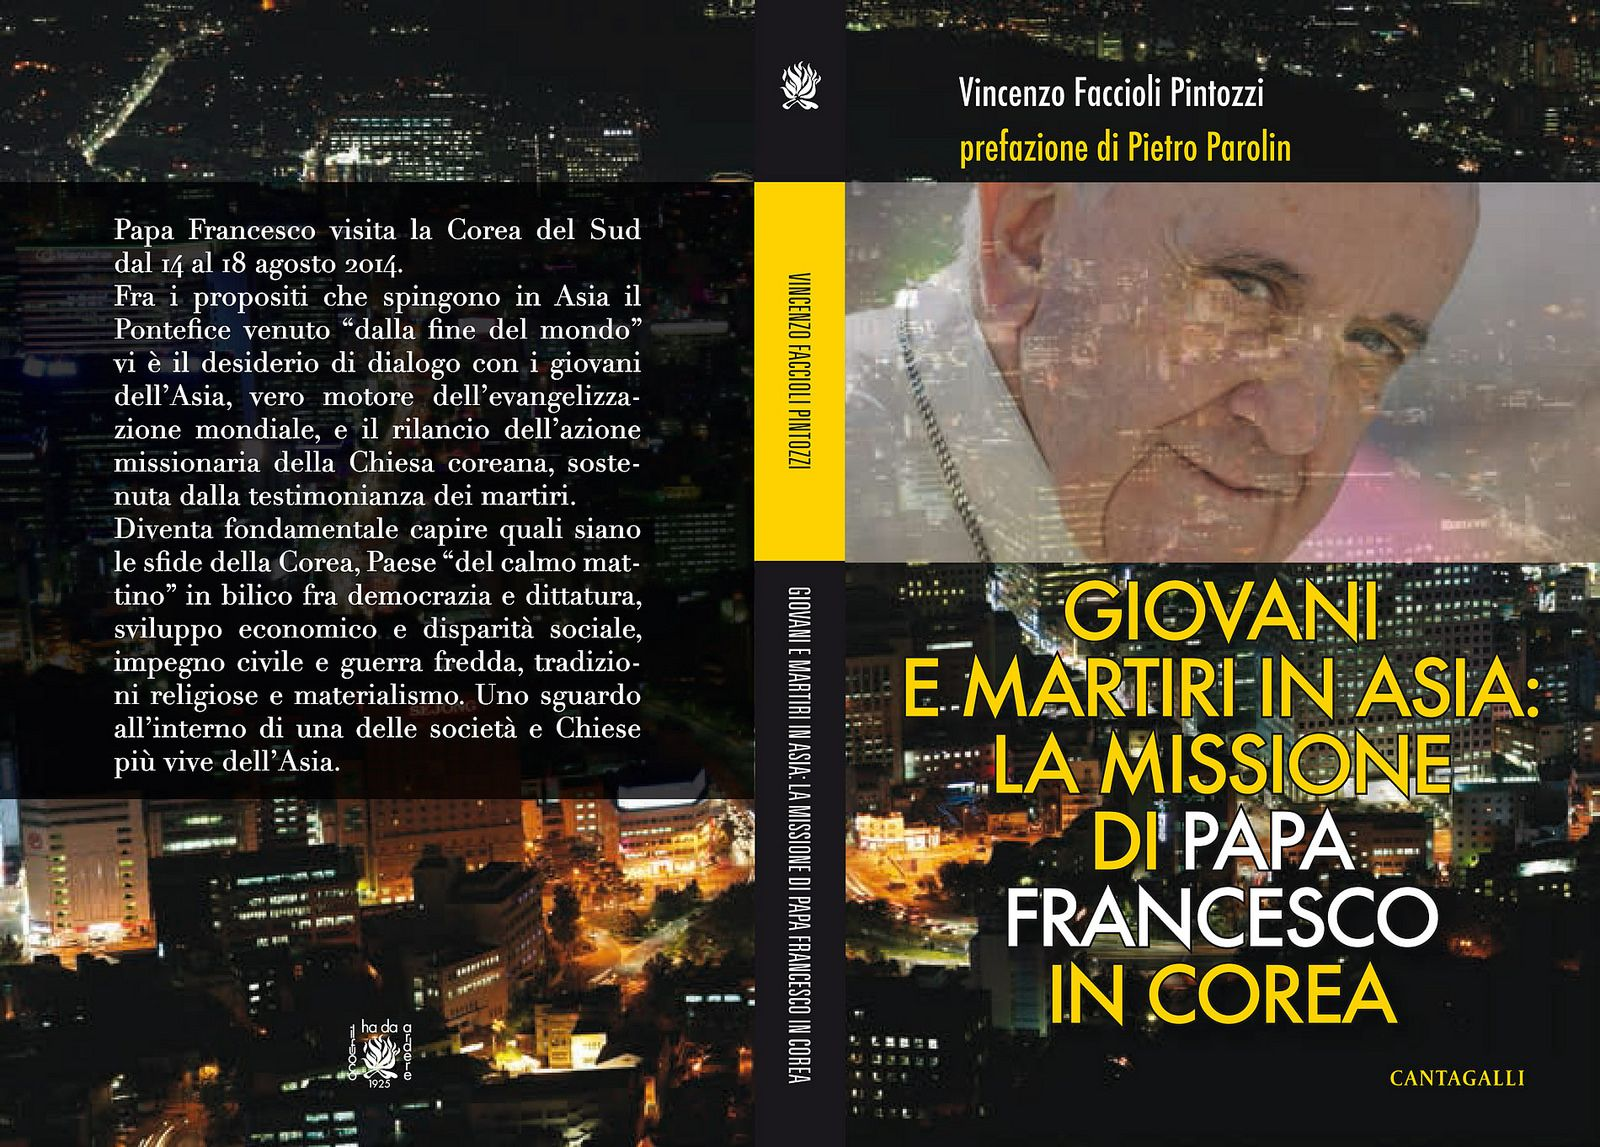 """Papa Francesco"", Corea, Asia"